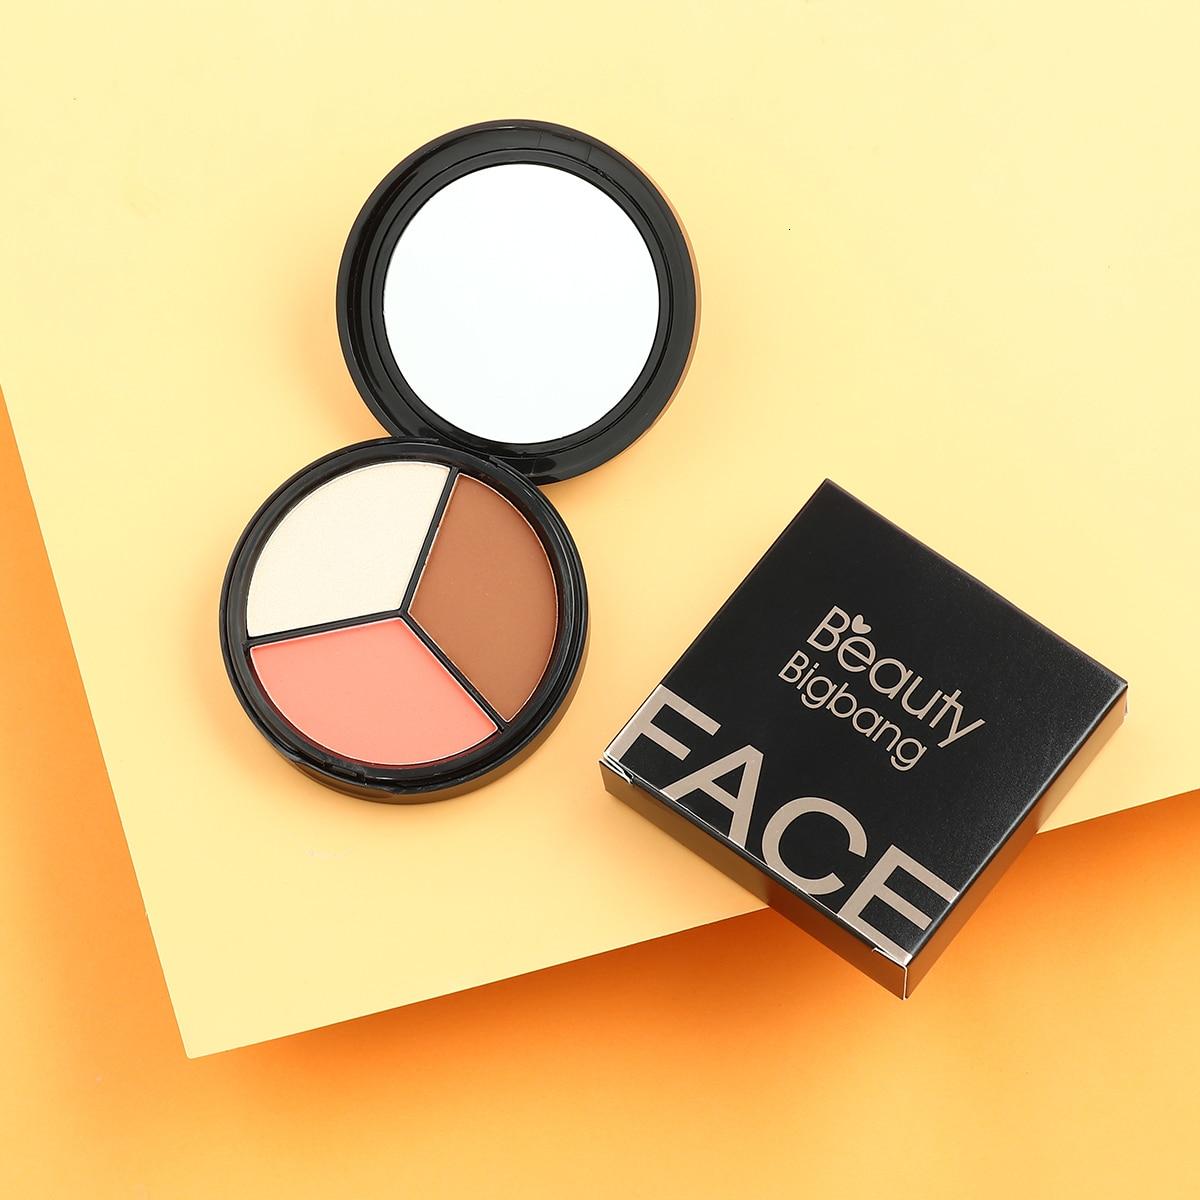 BeautyBigBang 3 Farben Gesicht Pulver Textmarker Iluminador Bronzer Make-Up Rosa Braun Schimmer Bronzer-Palette Kontur